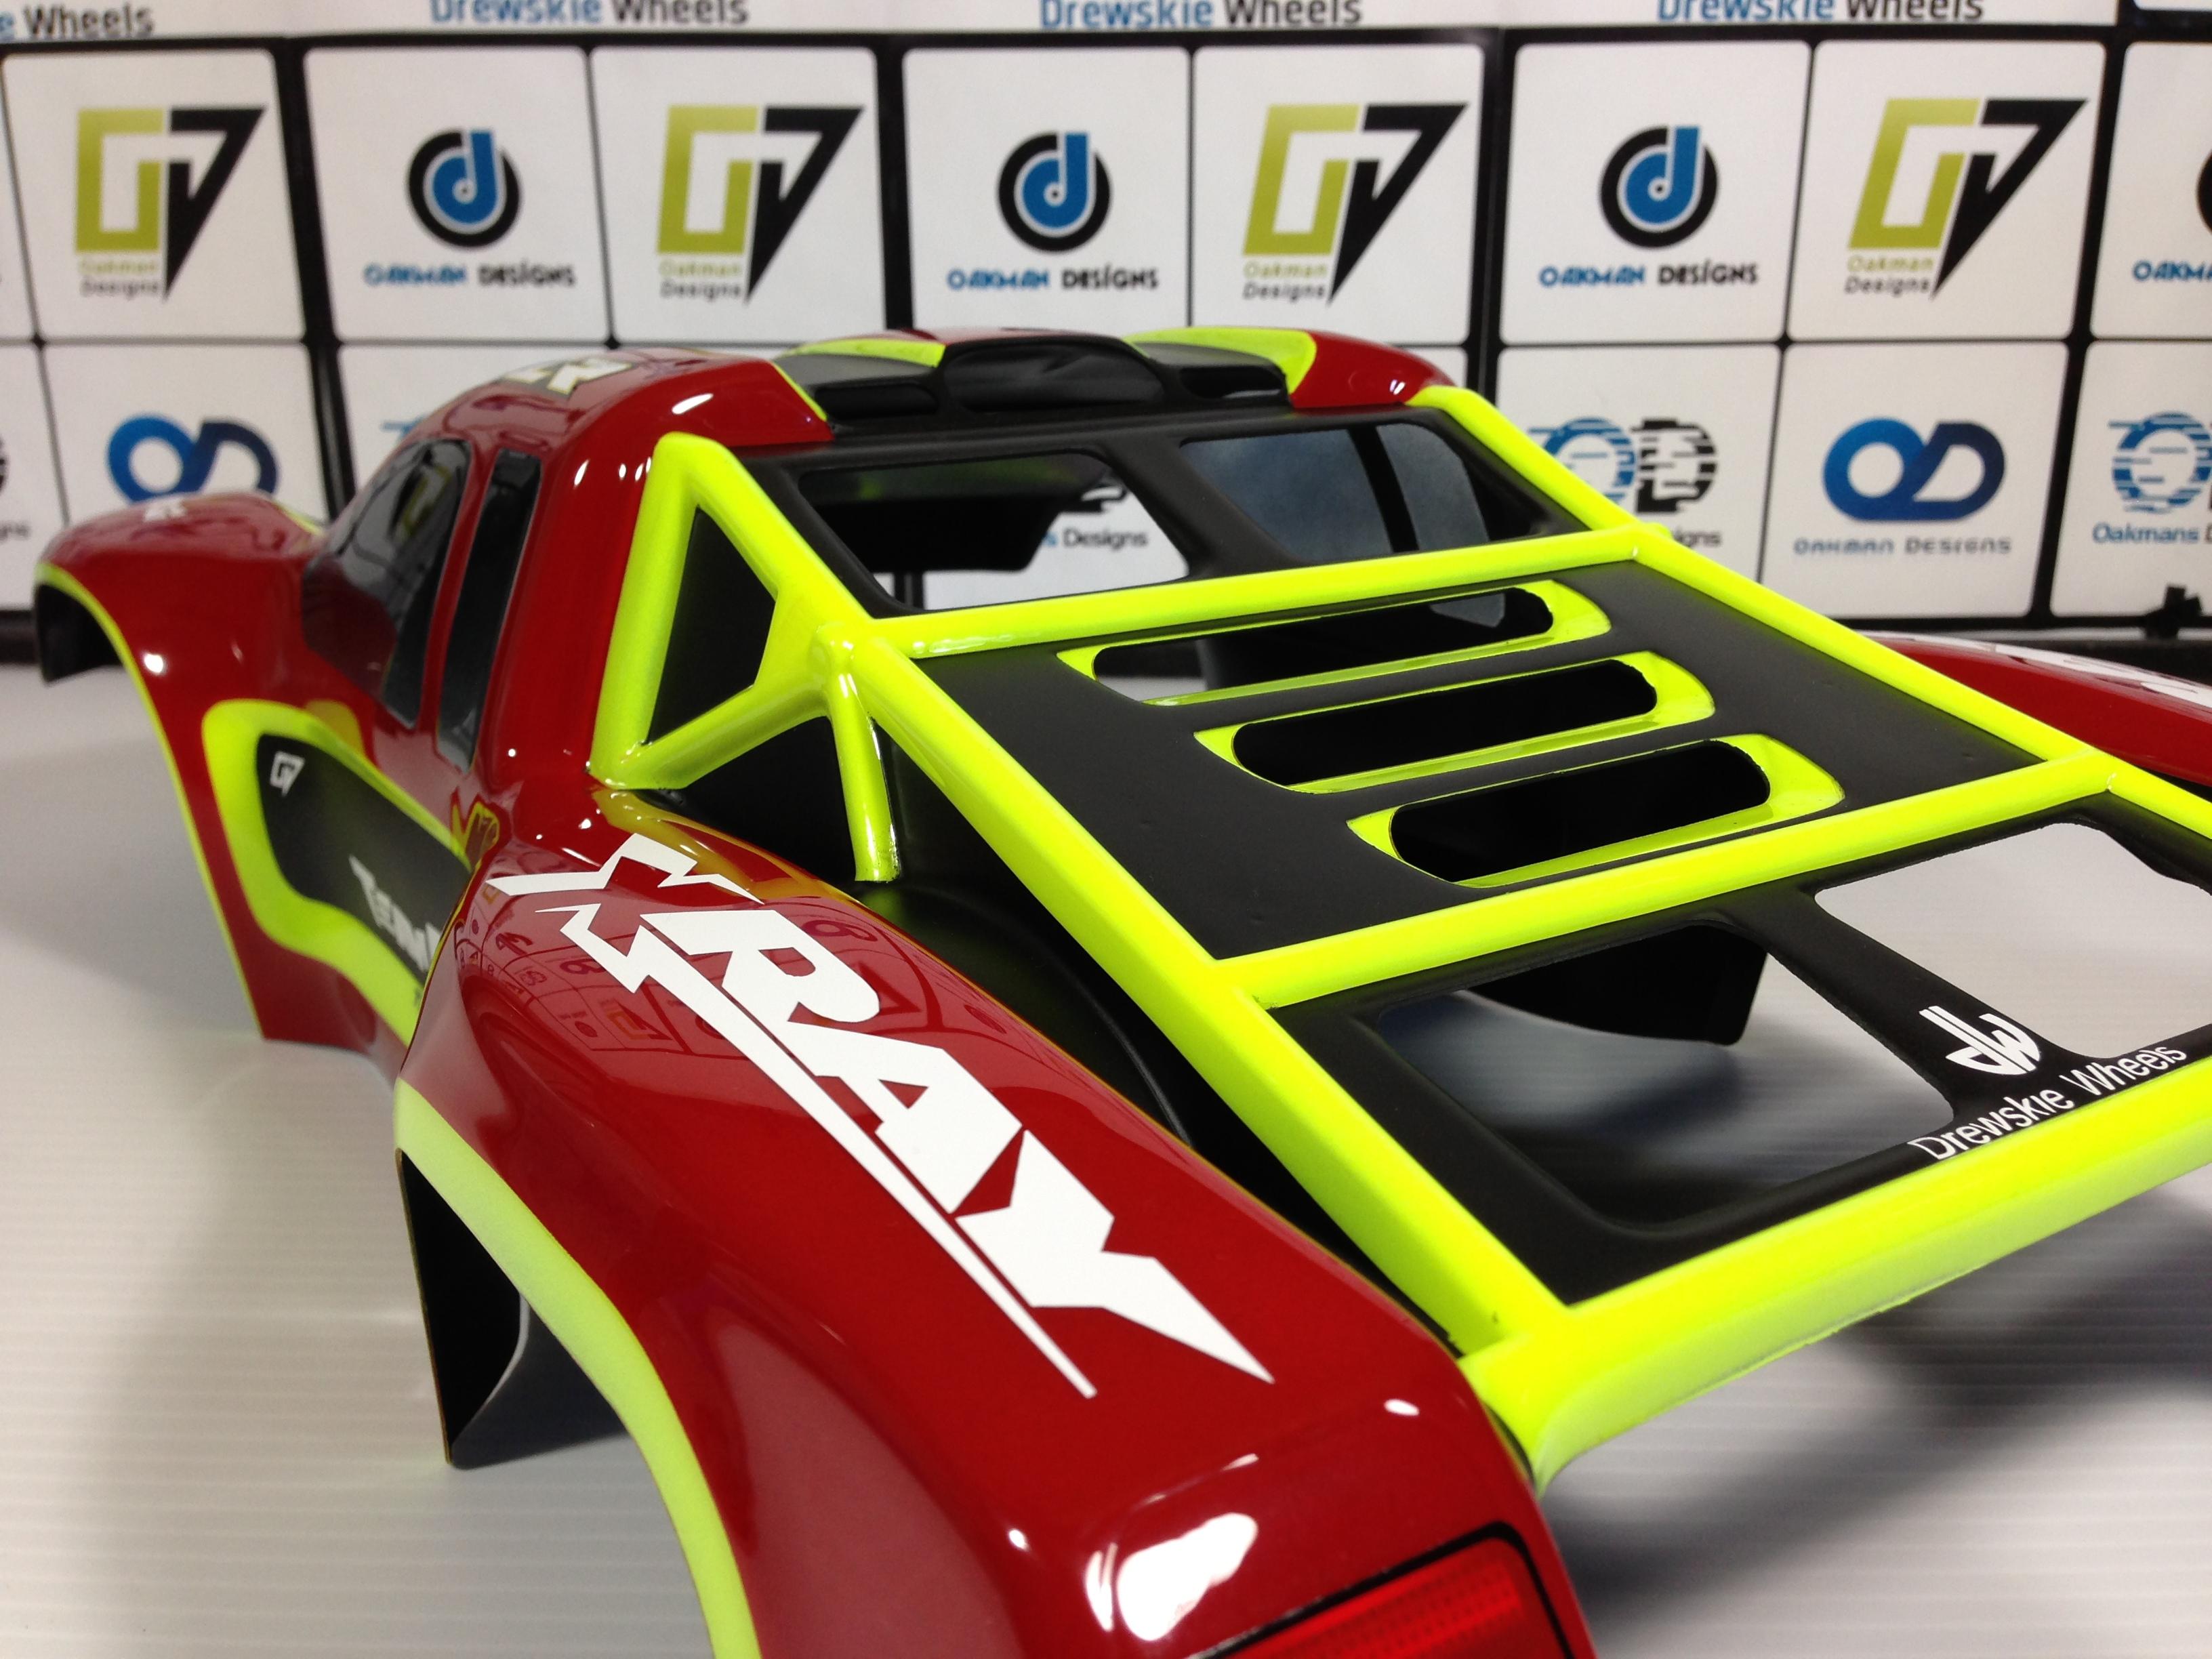 Team Losi TLR 22SCT, SCT, SCTE, Body | Oak-man Designs